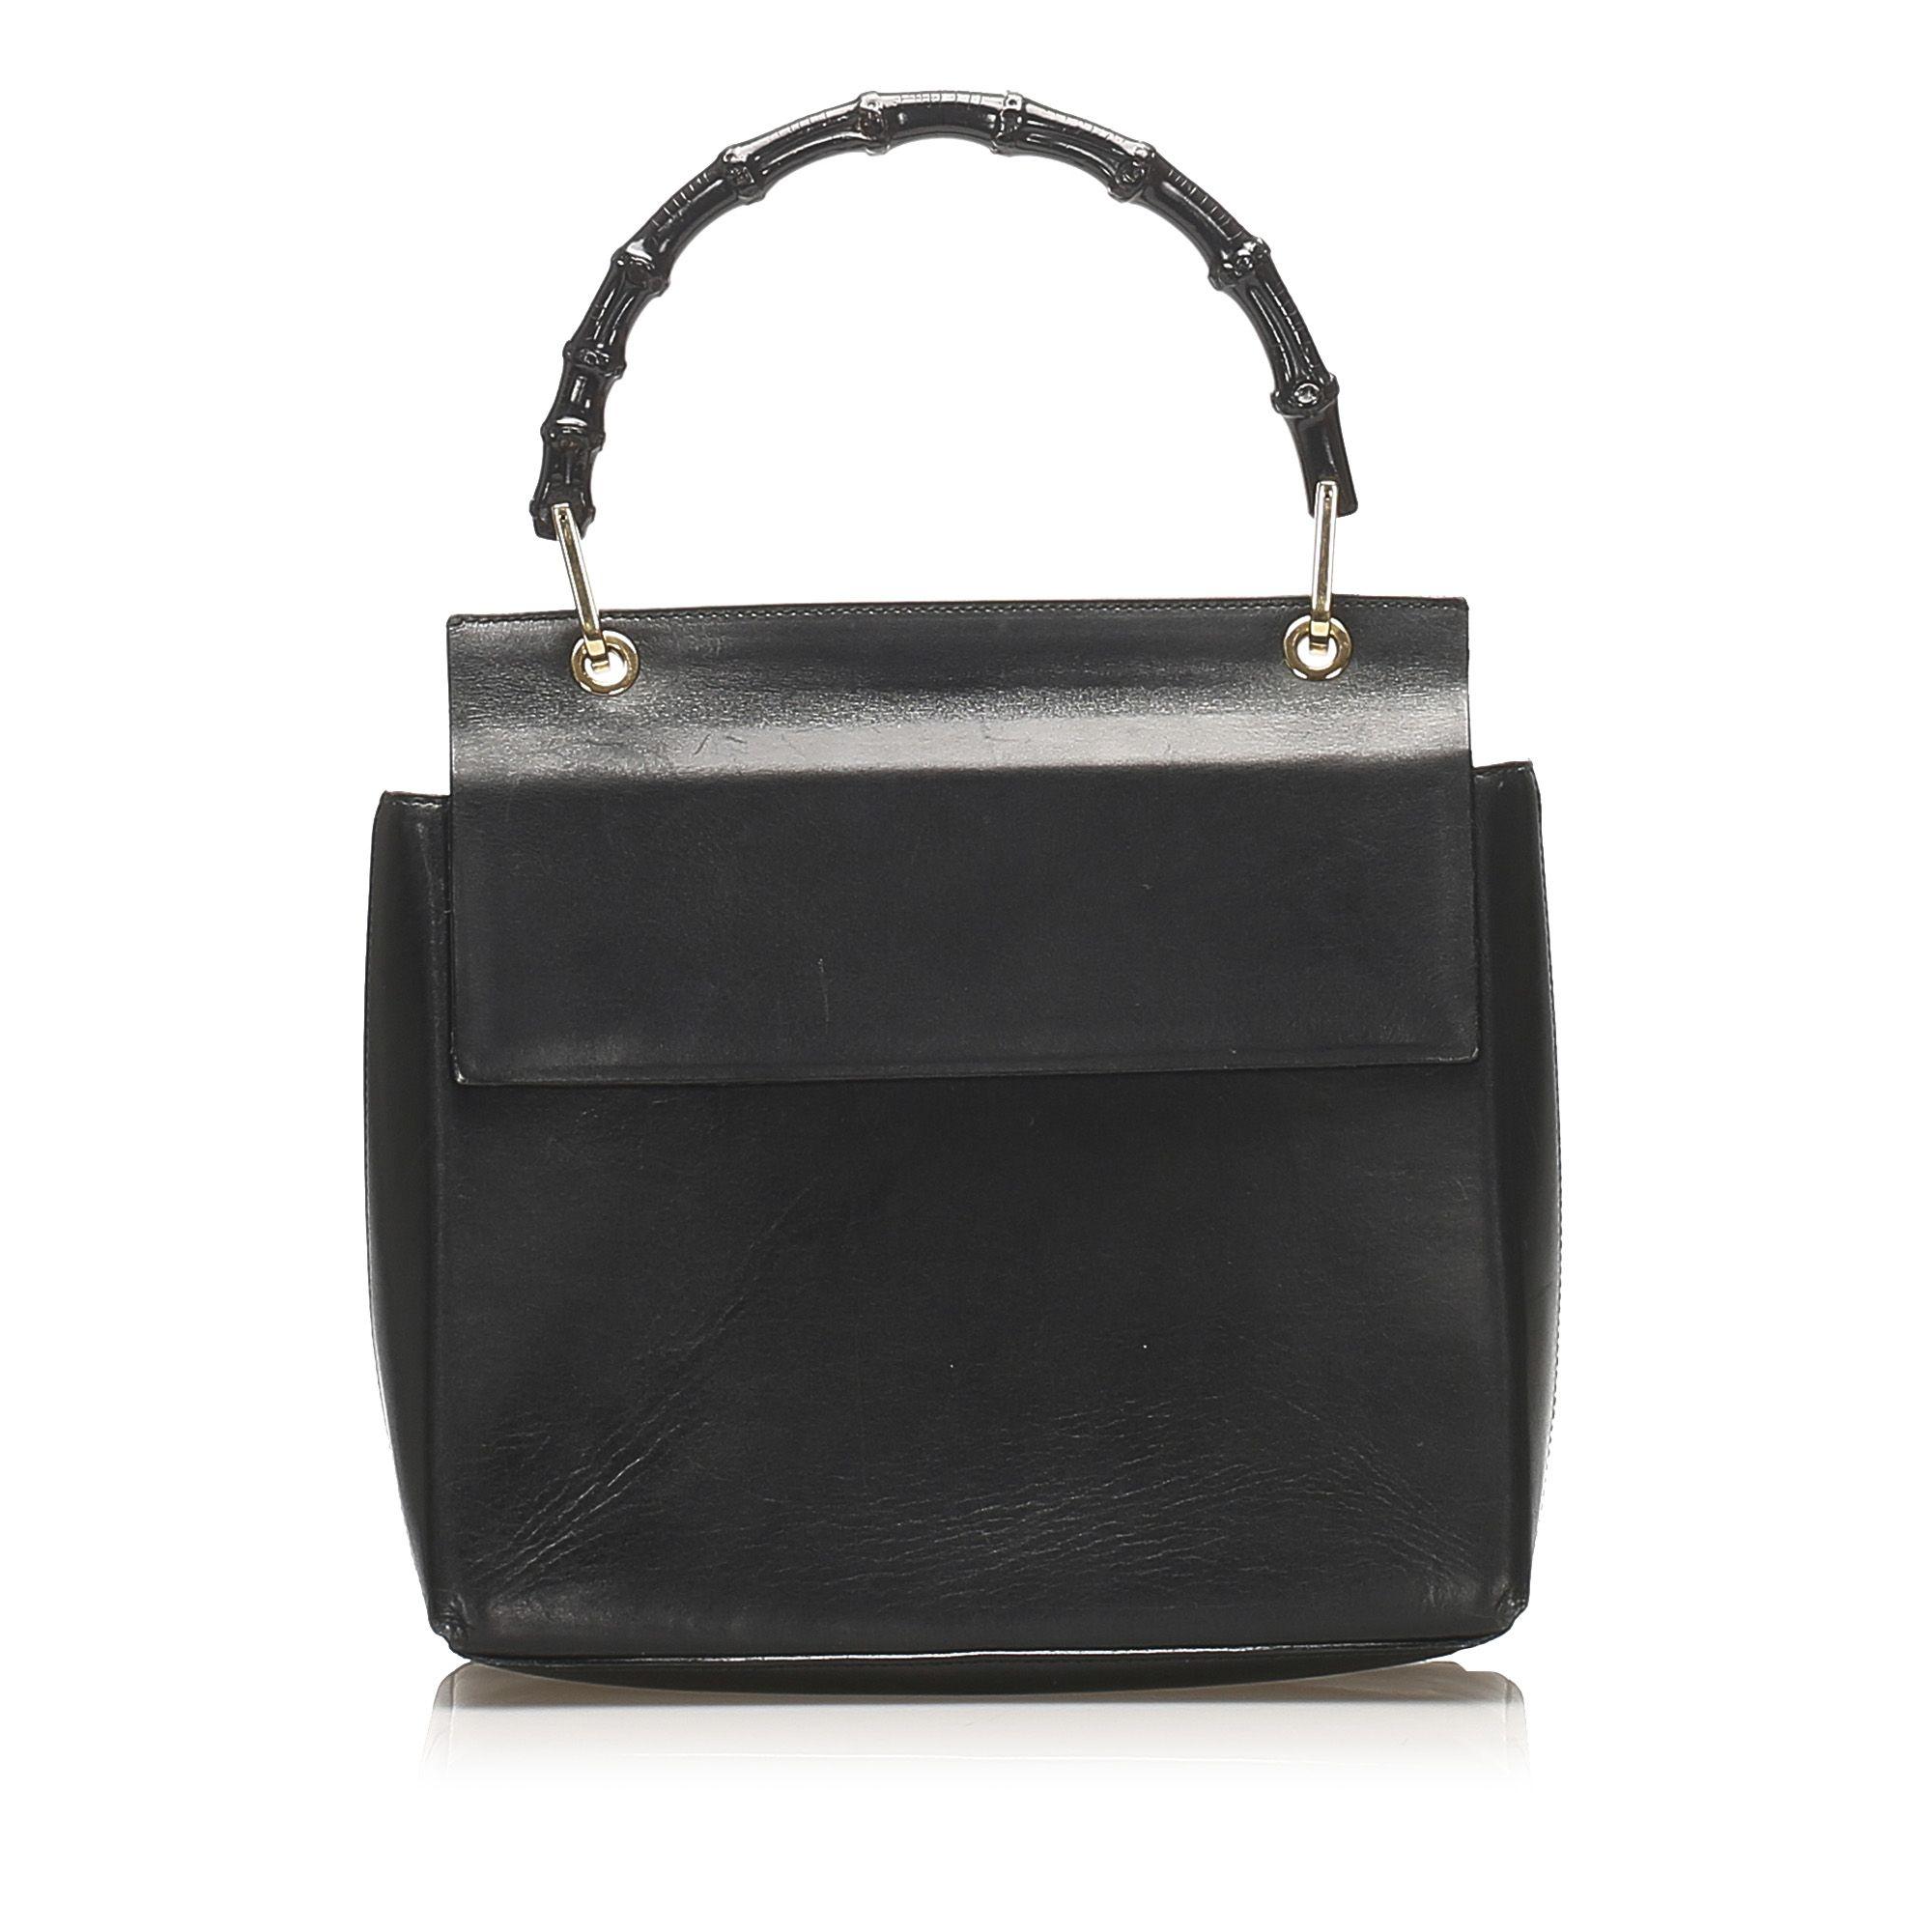 Vintage Gucci Bamboo Leather Handbag Black